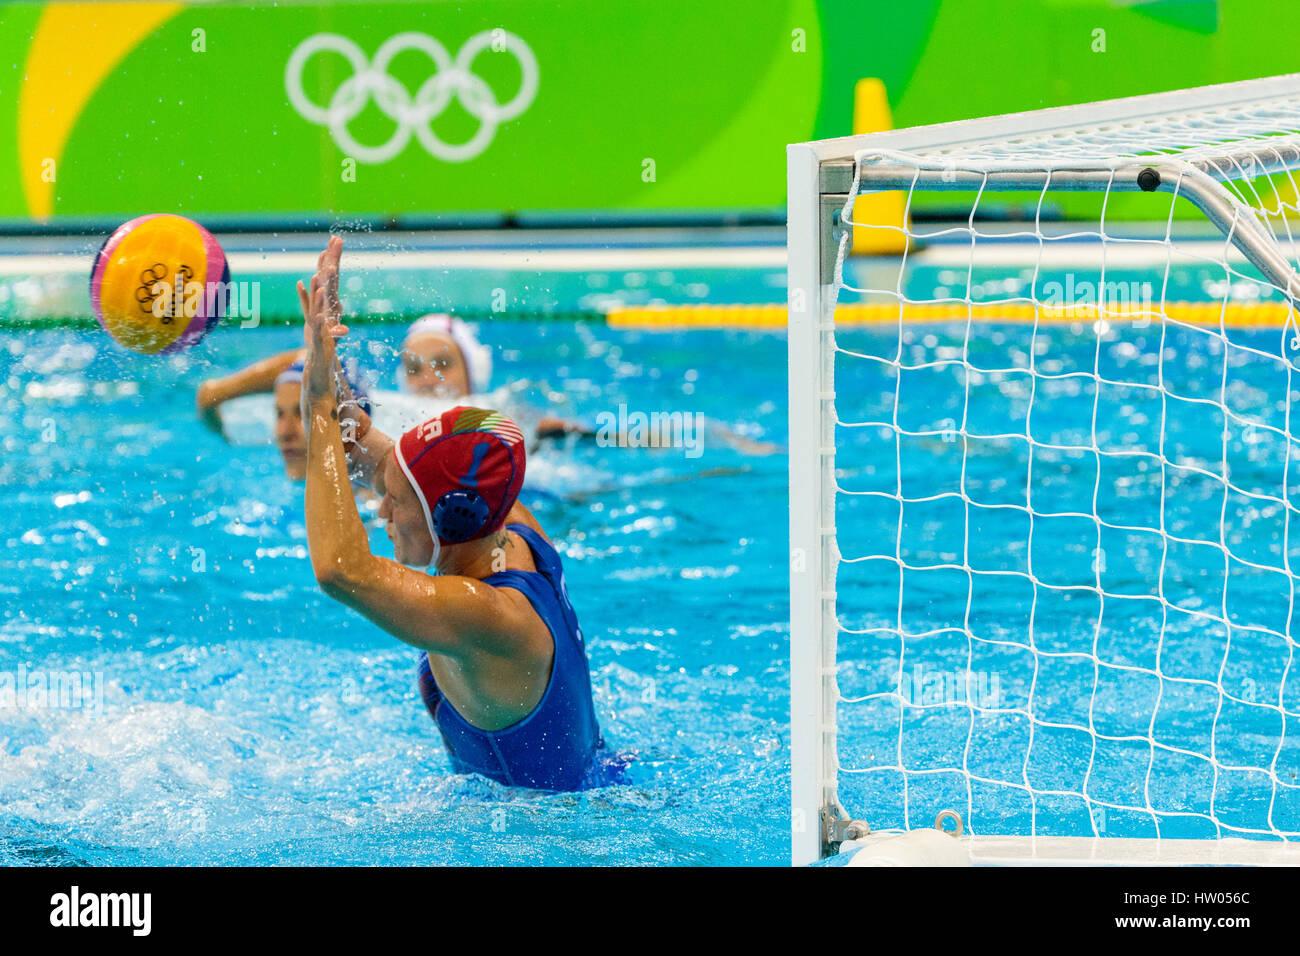 Rio de Janeiro, Brazil. 19 August 2016  Goalkeeper Giulia Gorlero (ITA) competes in the women's water polo gold - Stock Image